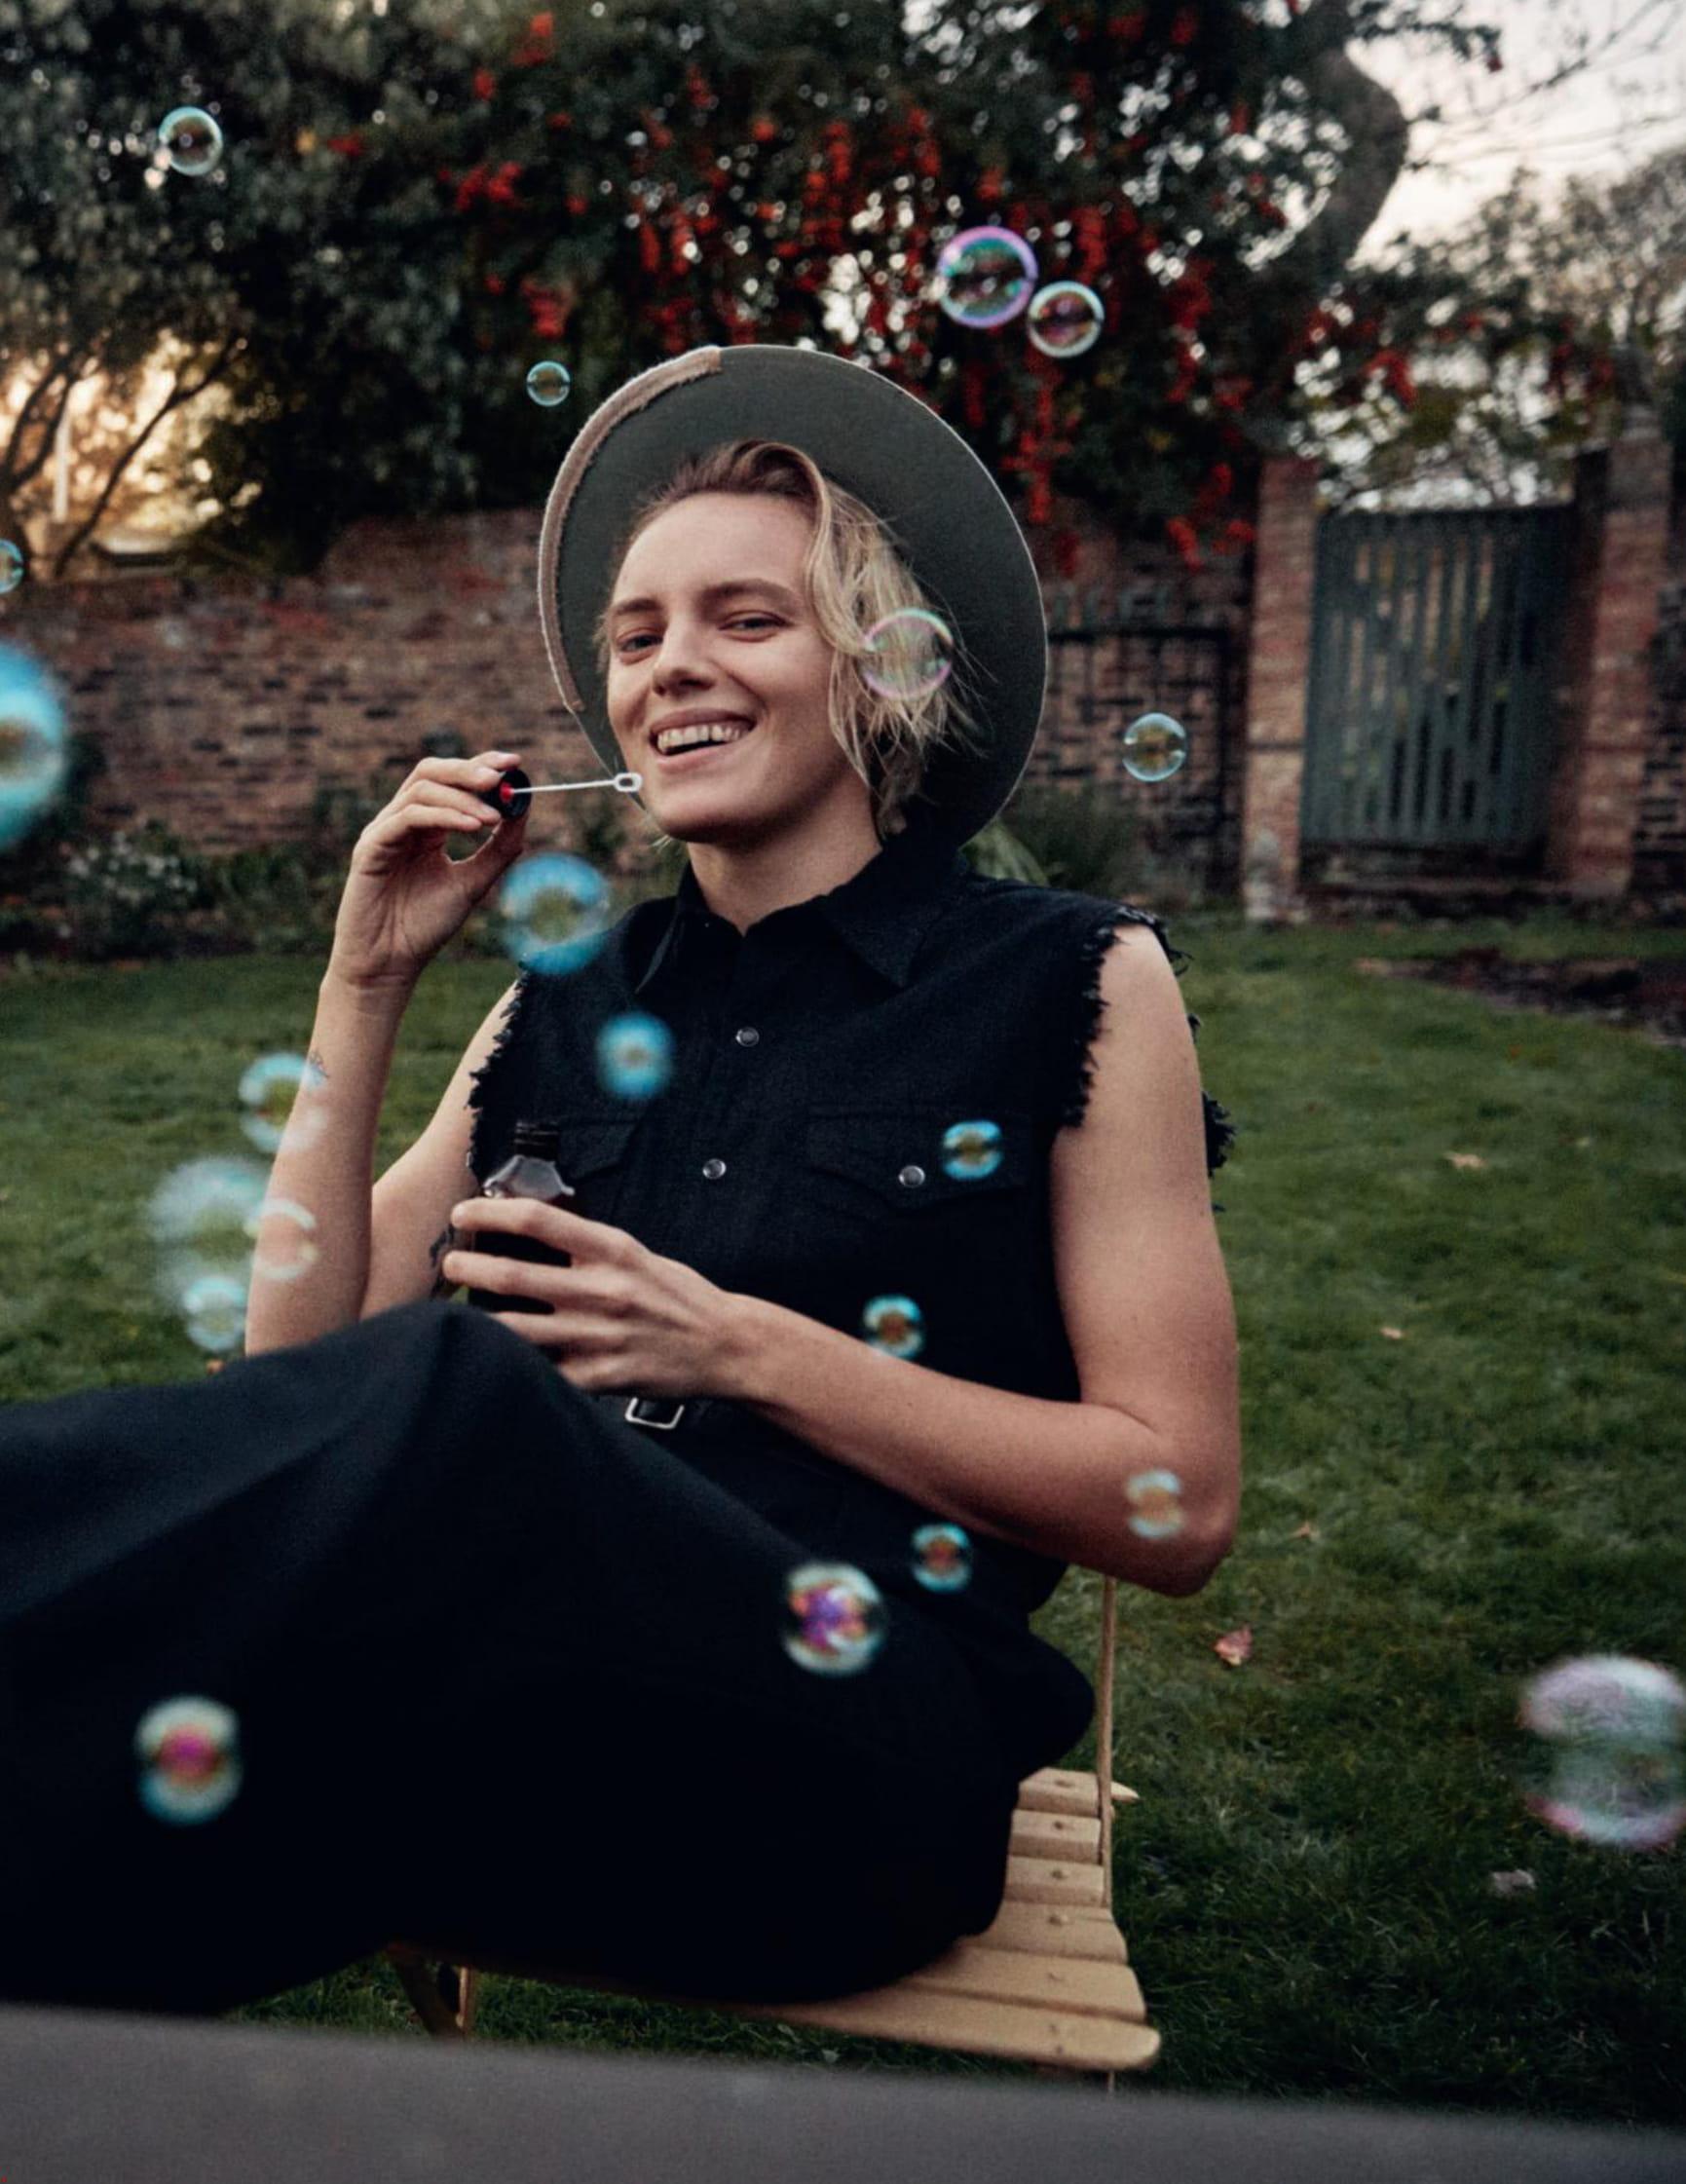 Erika Linder by Mikael Jansson for Vogue Paris Feb 2019 (4).jpg